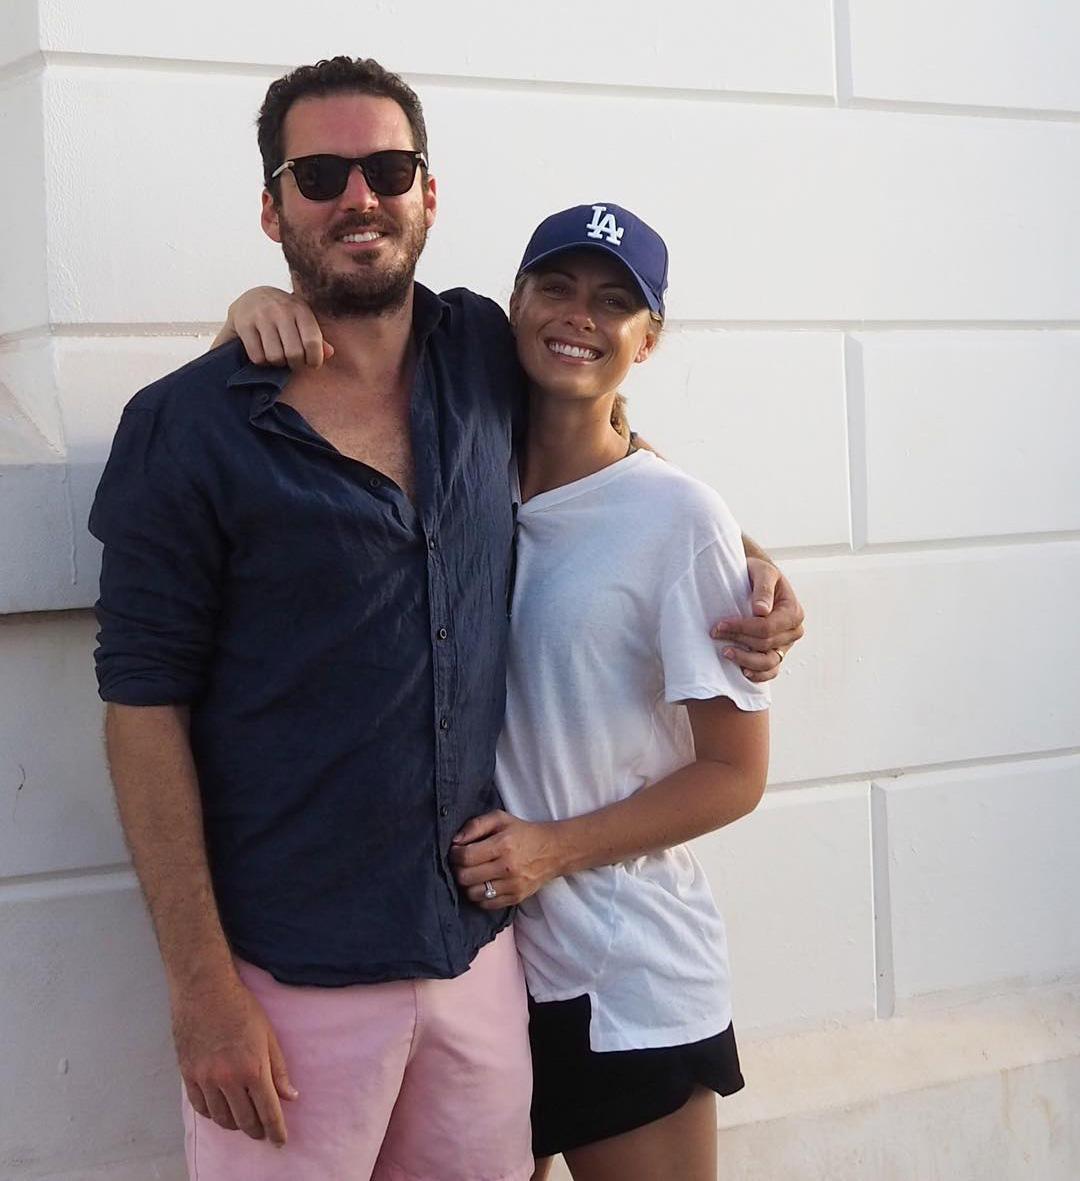 Sylvia jeffreys peter stefanovic dating after divorce